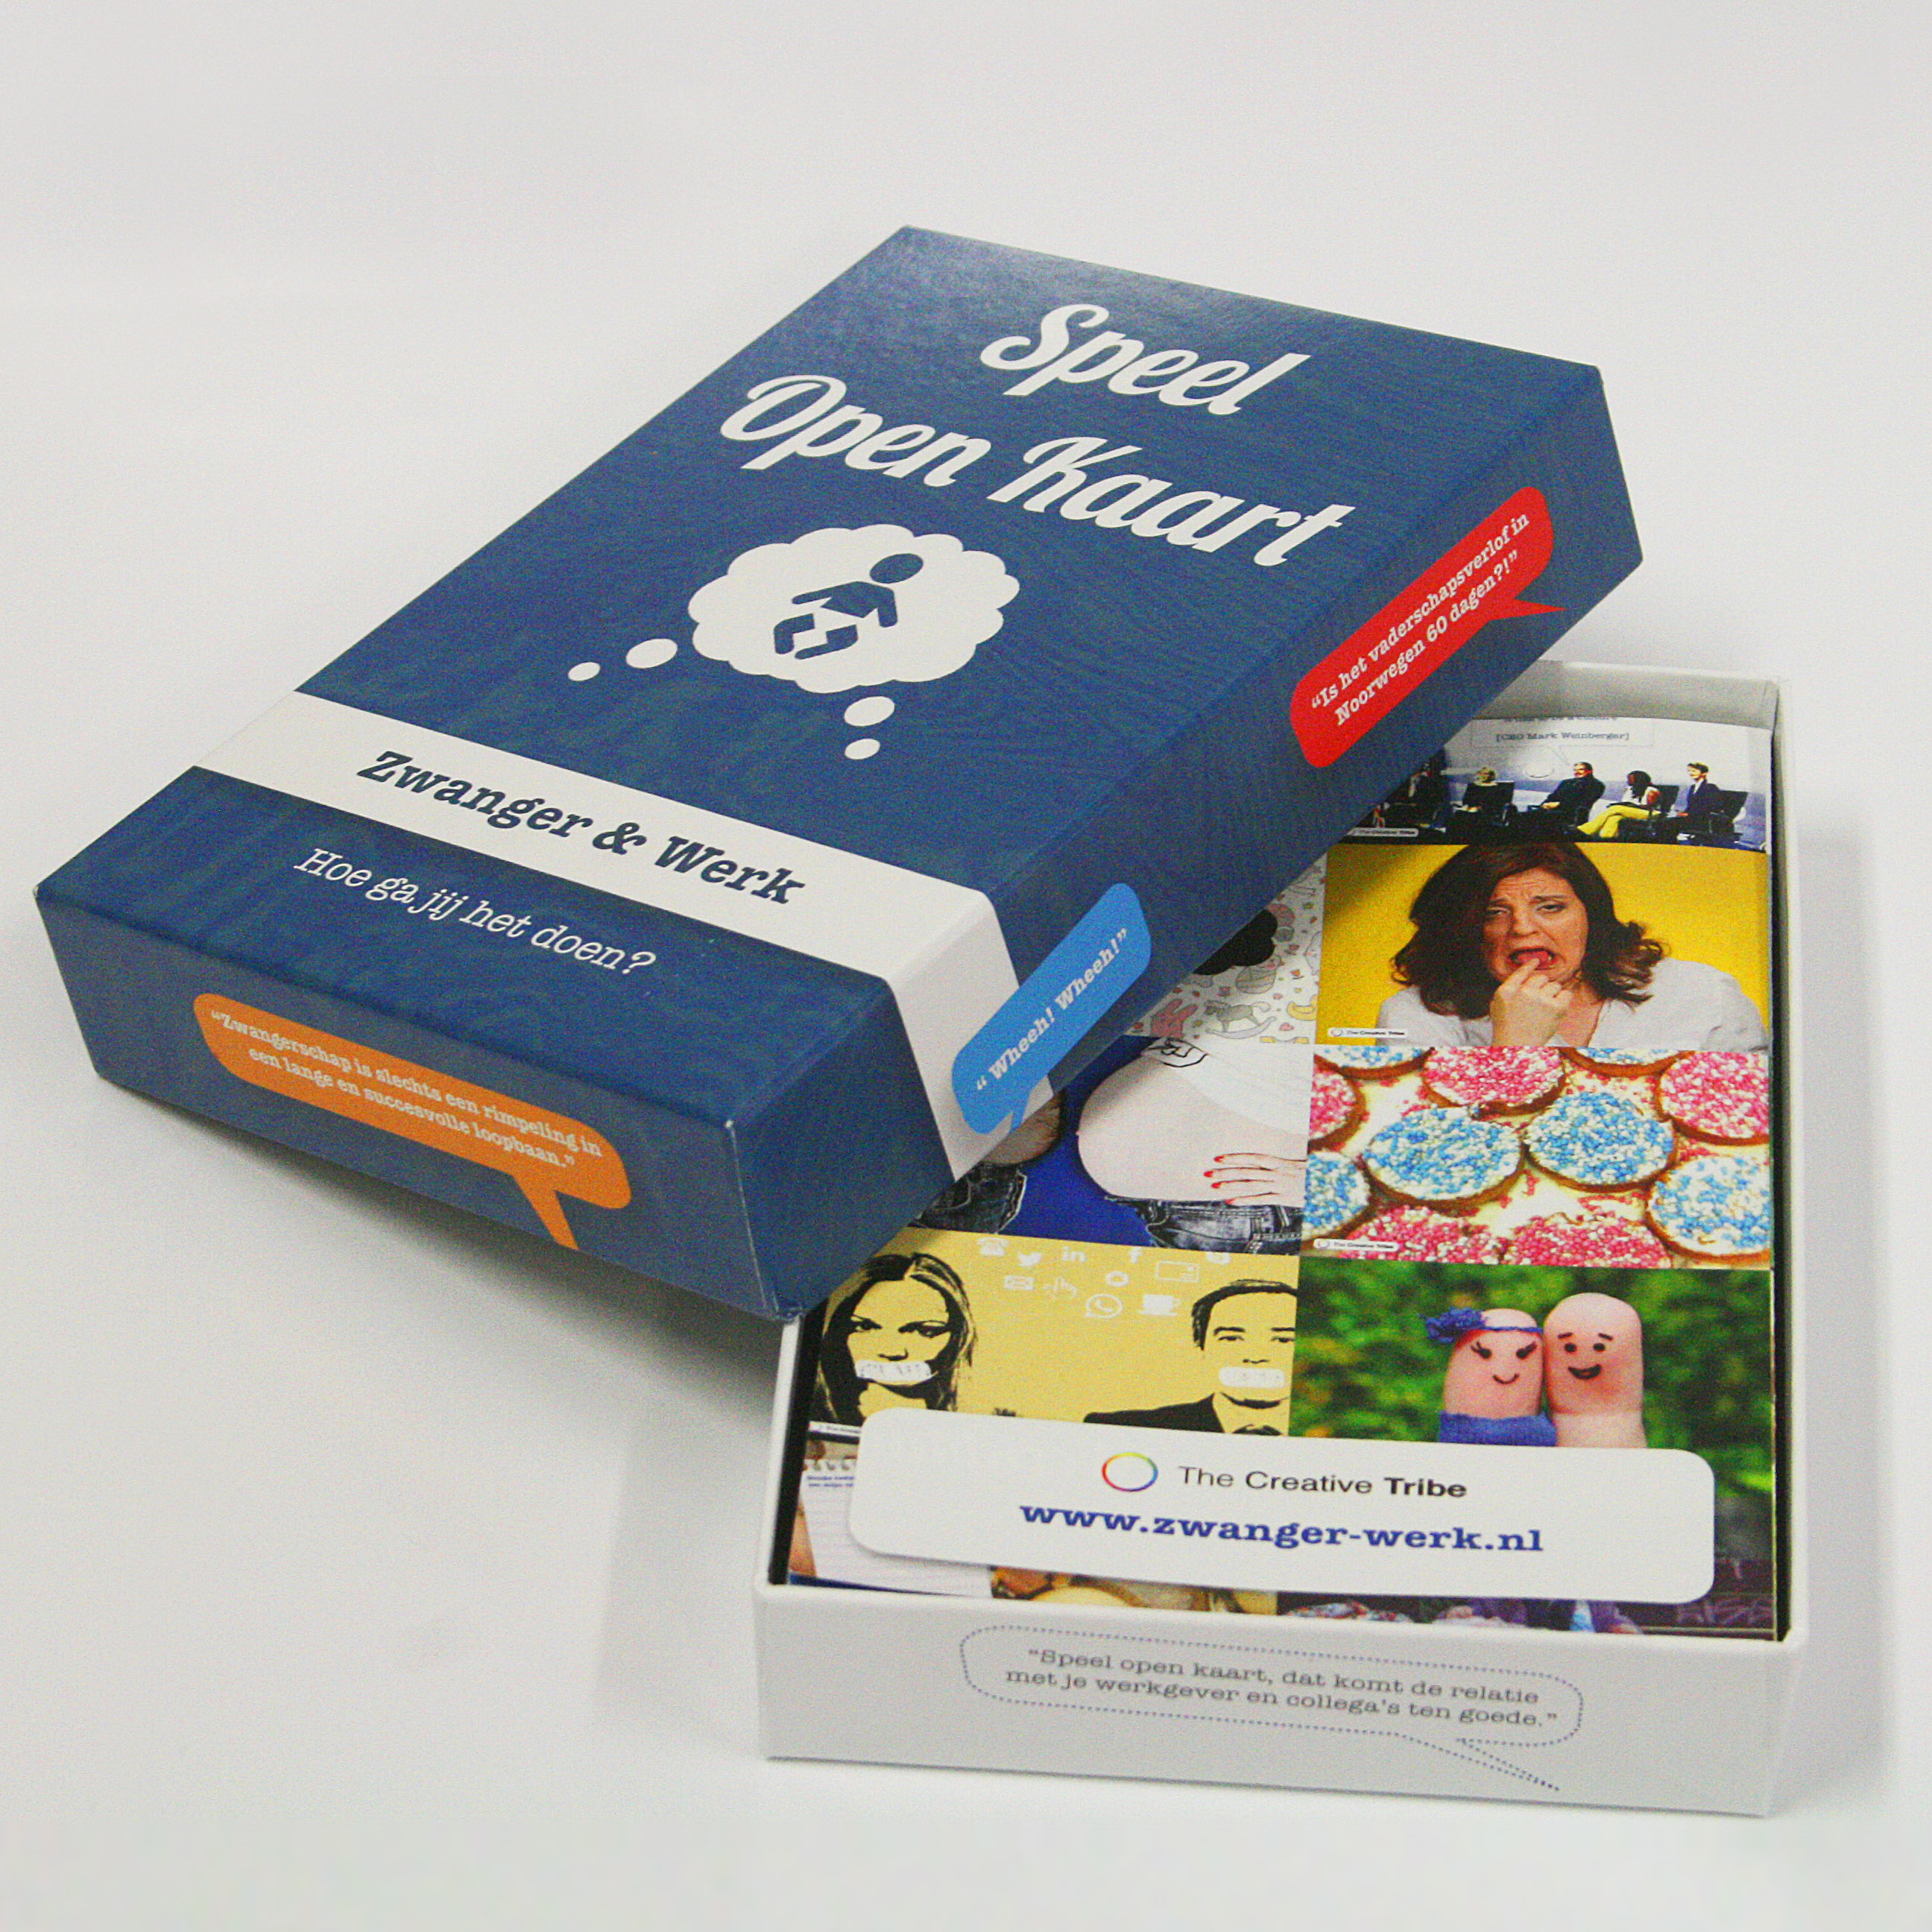 Speel Open Kaart – www.zwanger-werk.nl